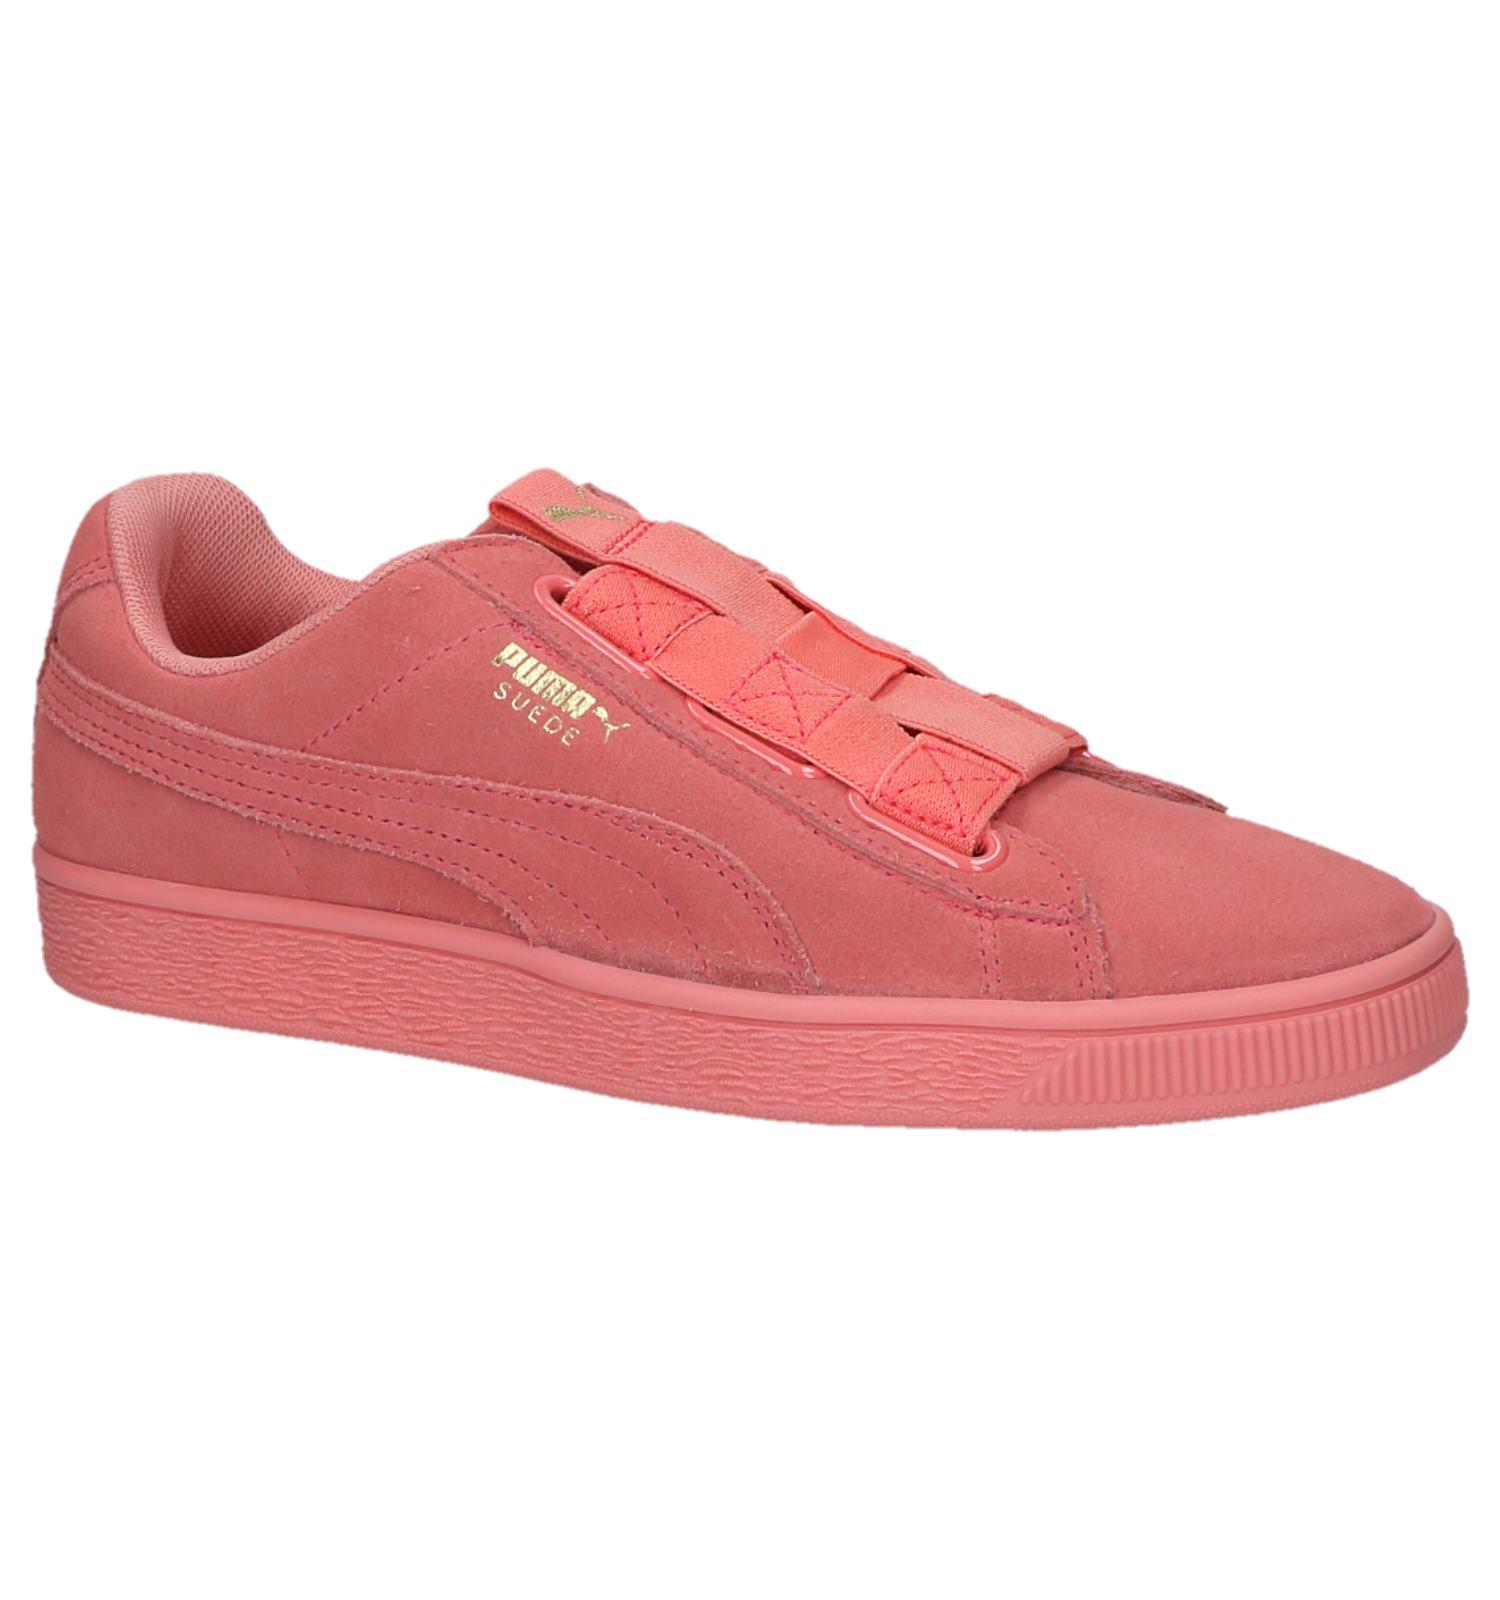 Roze Sneakers Puma Suede Maze | SCHOENENTORFS.NL | Gratis verzend en retour